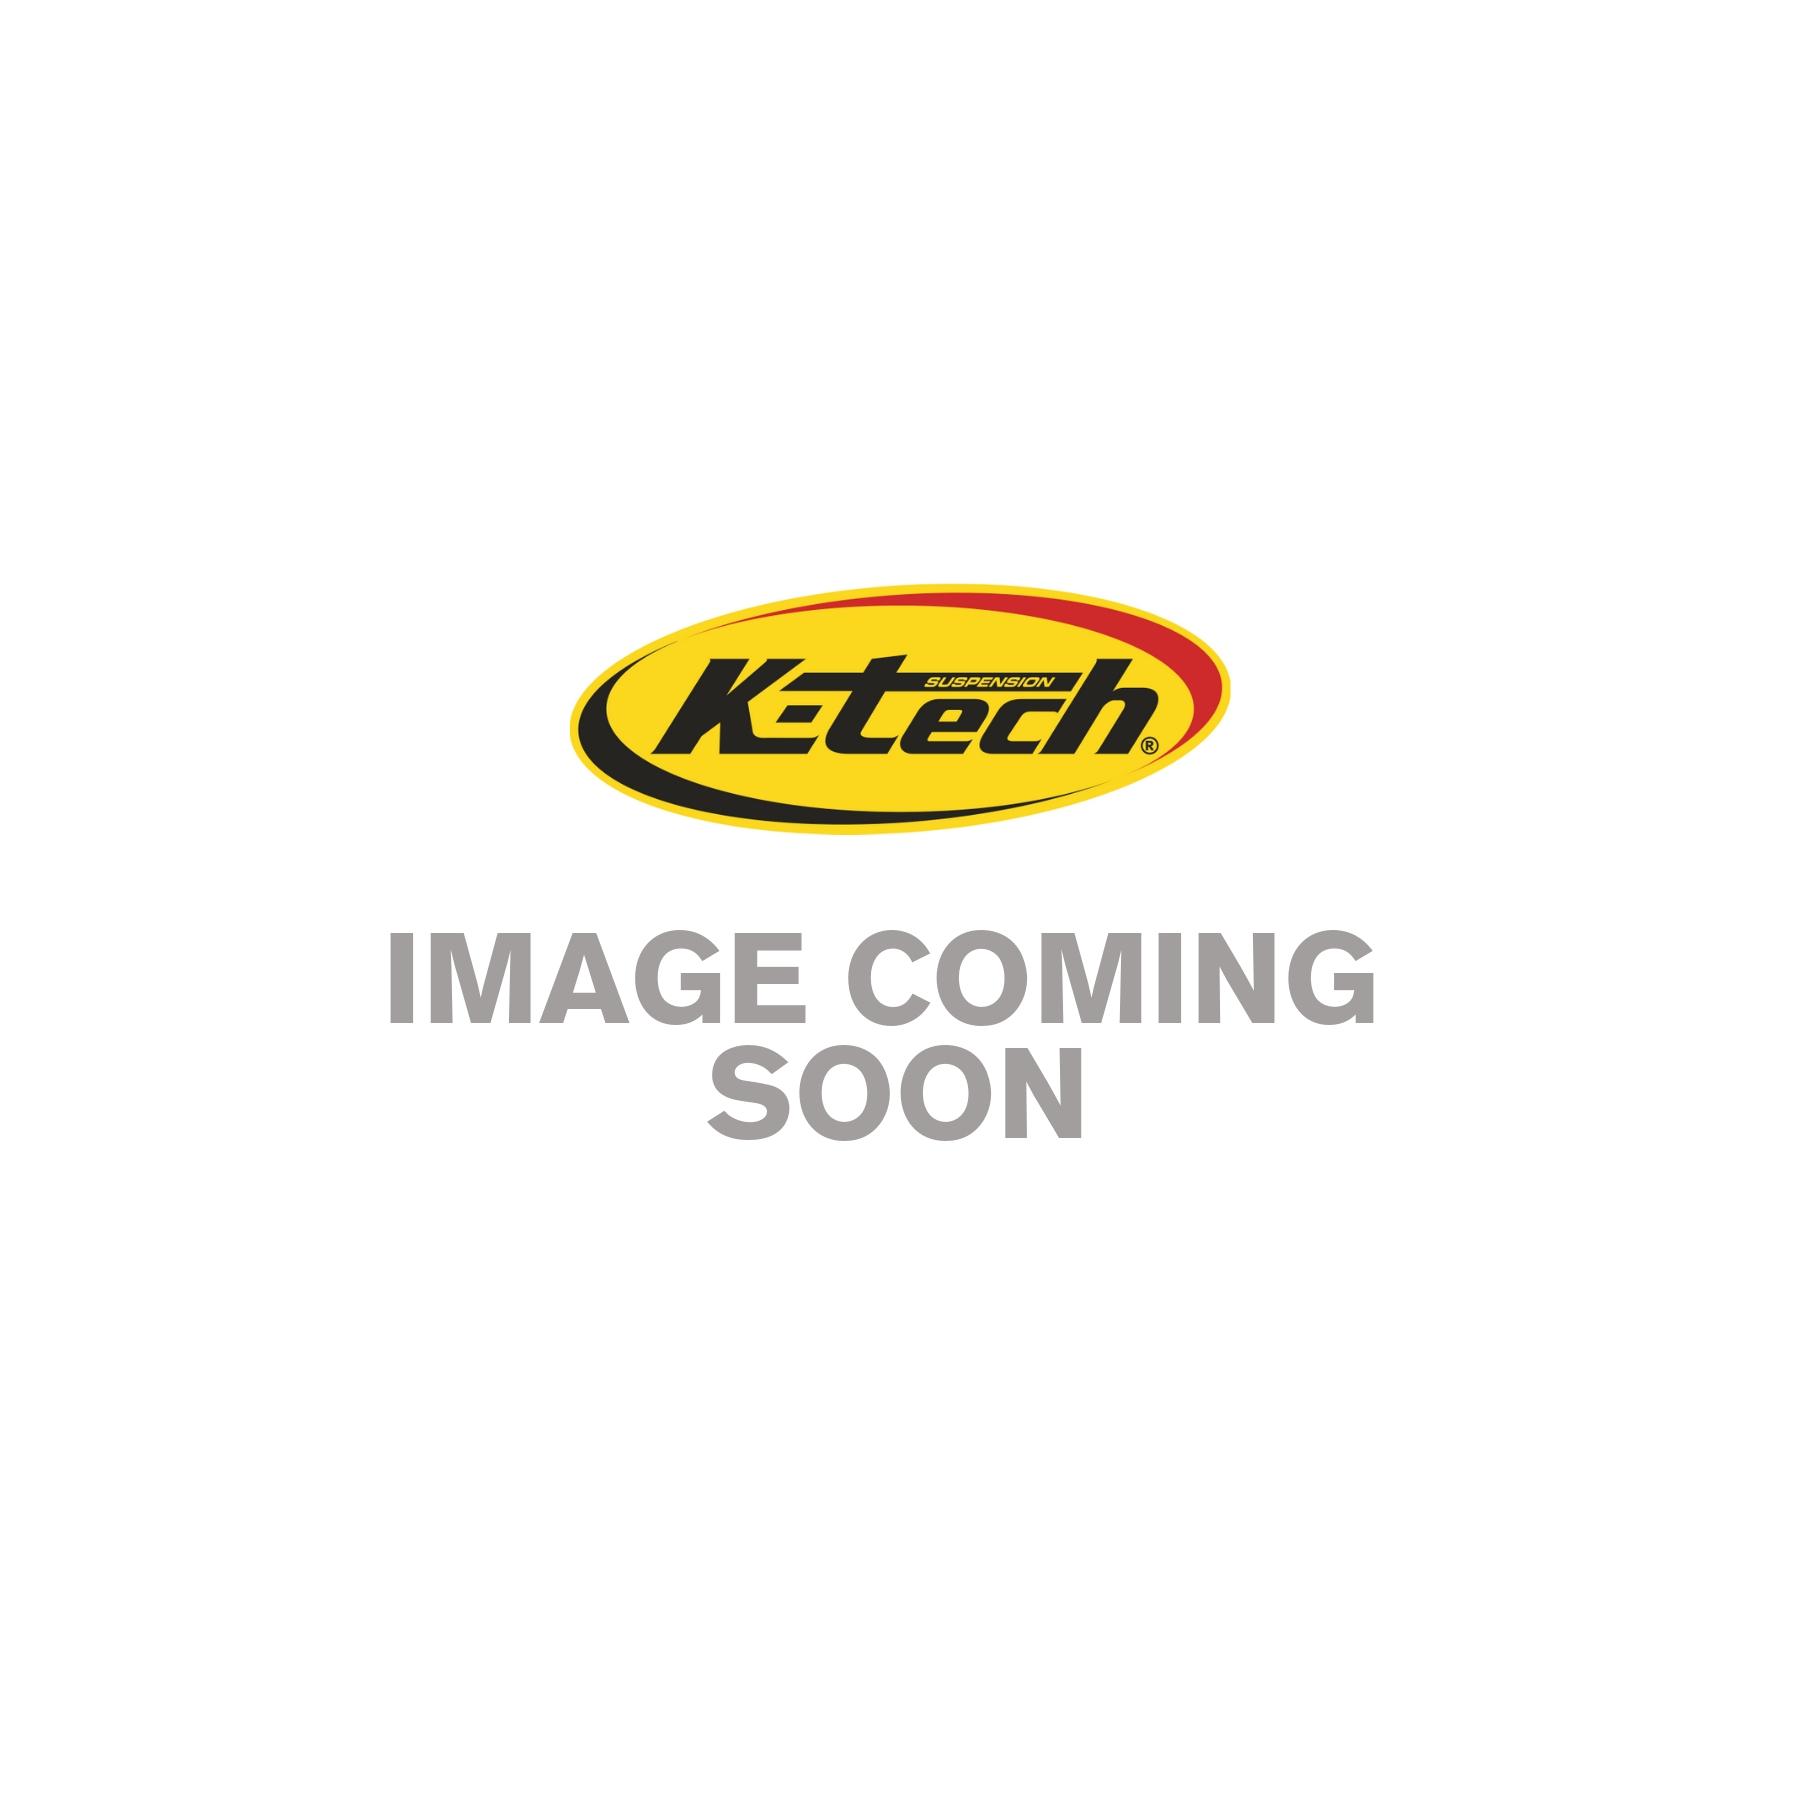 25IDS Front Fork Cartridges Yamaha YZF-R1 2009-2014 Soqi